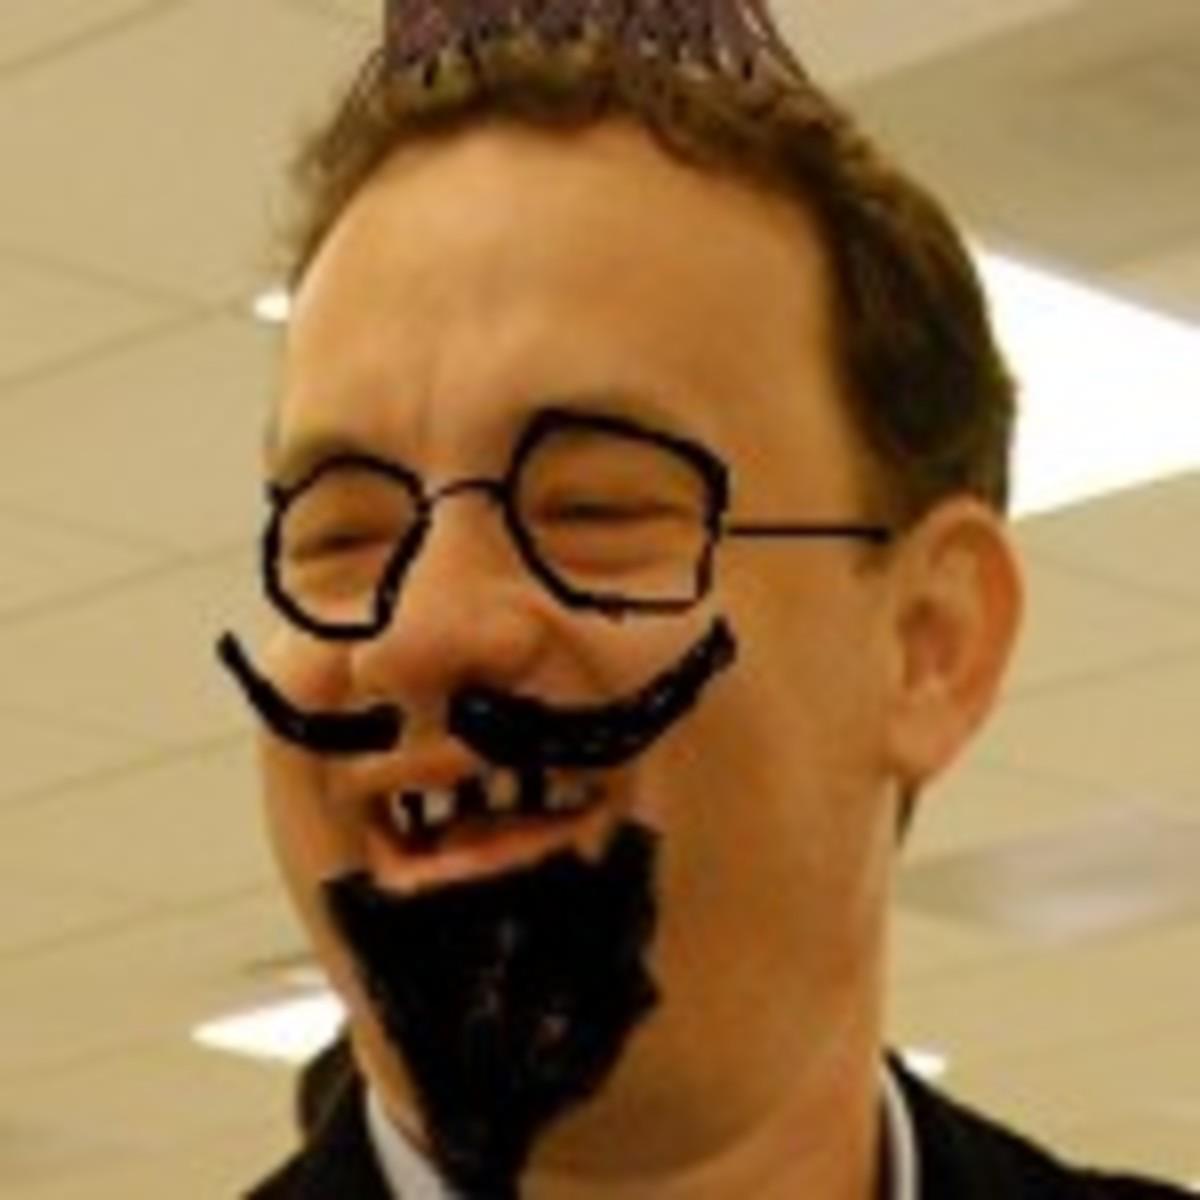 Tom_Hanks,_smiling_2a